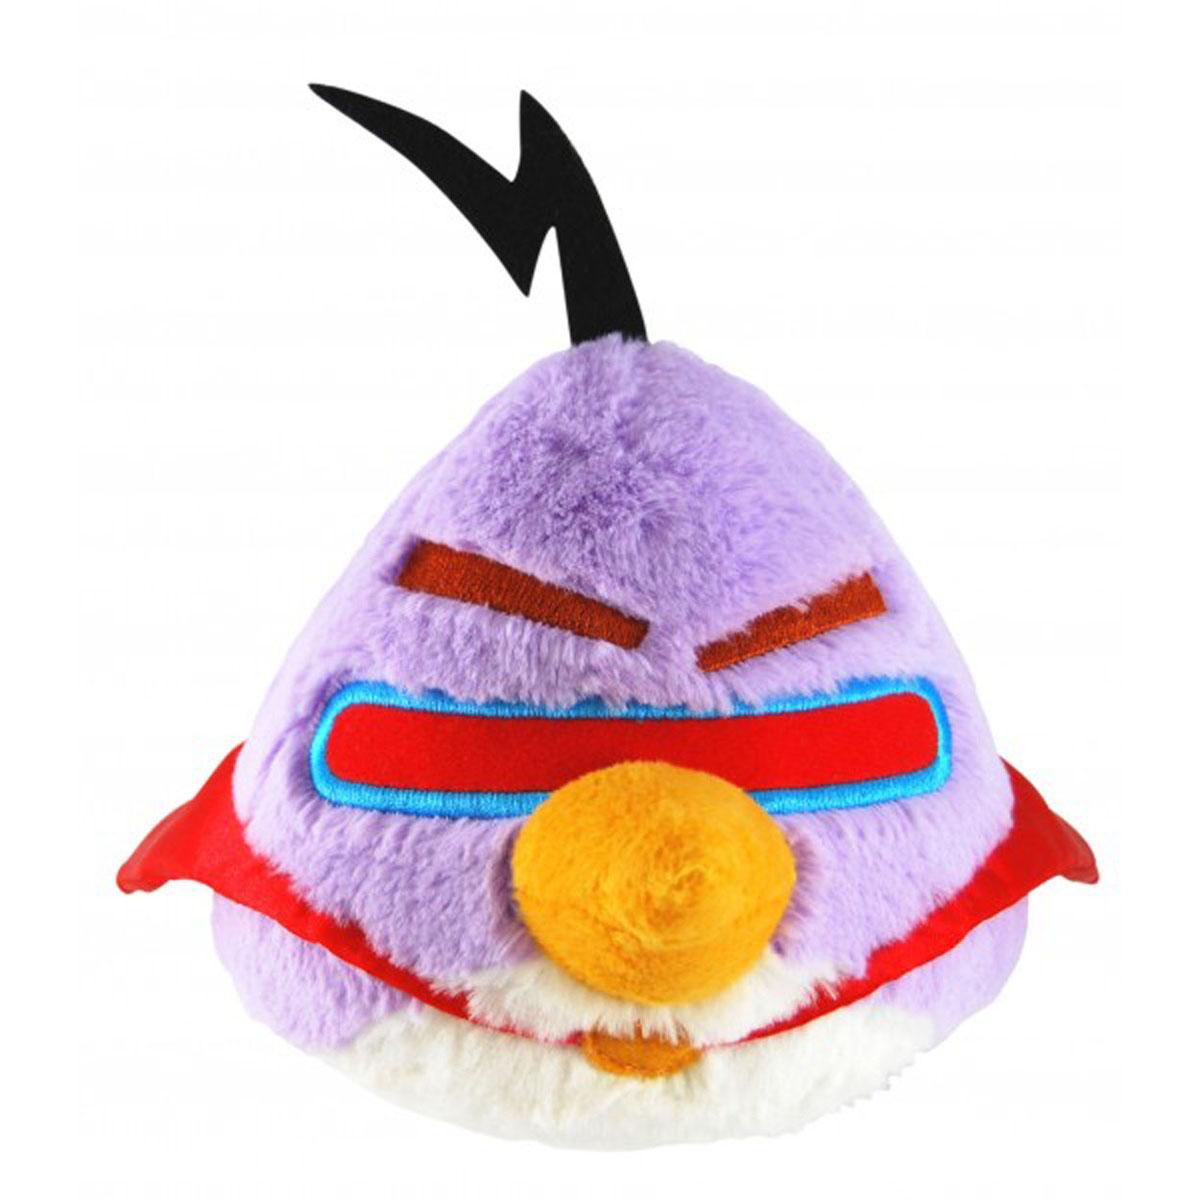 Мягкая игрушка Angry Birds Space, фиолетовая птица, со звуком, 40 см